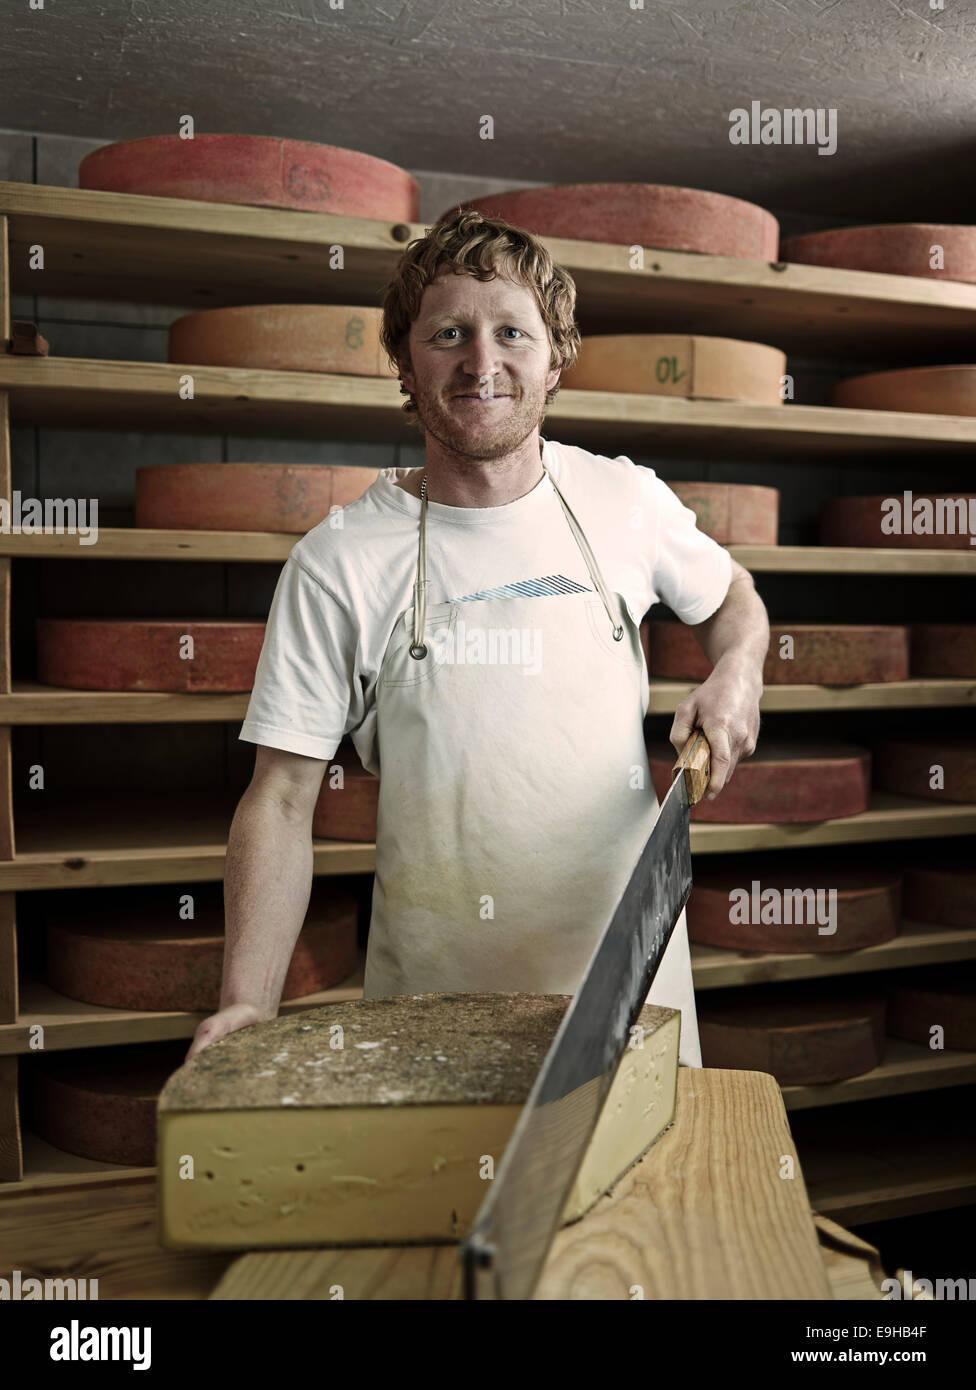 Dairyman cutting a mountain cheese, Steinbergalm, Inneralpbach, Alpbach, Tyrol, Austria Stock Photo